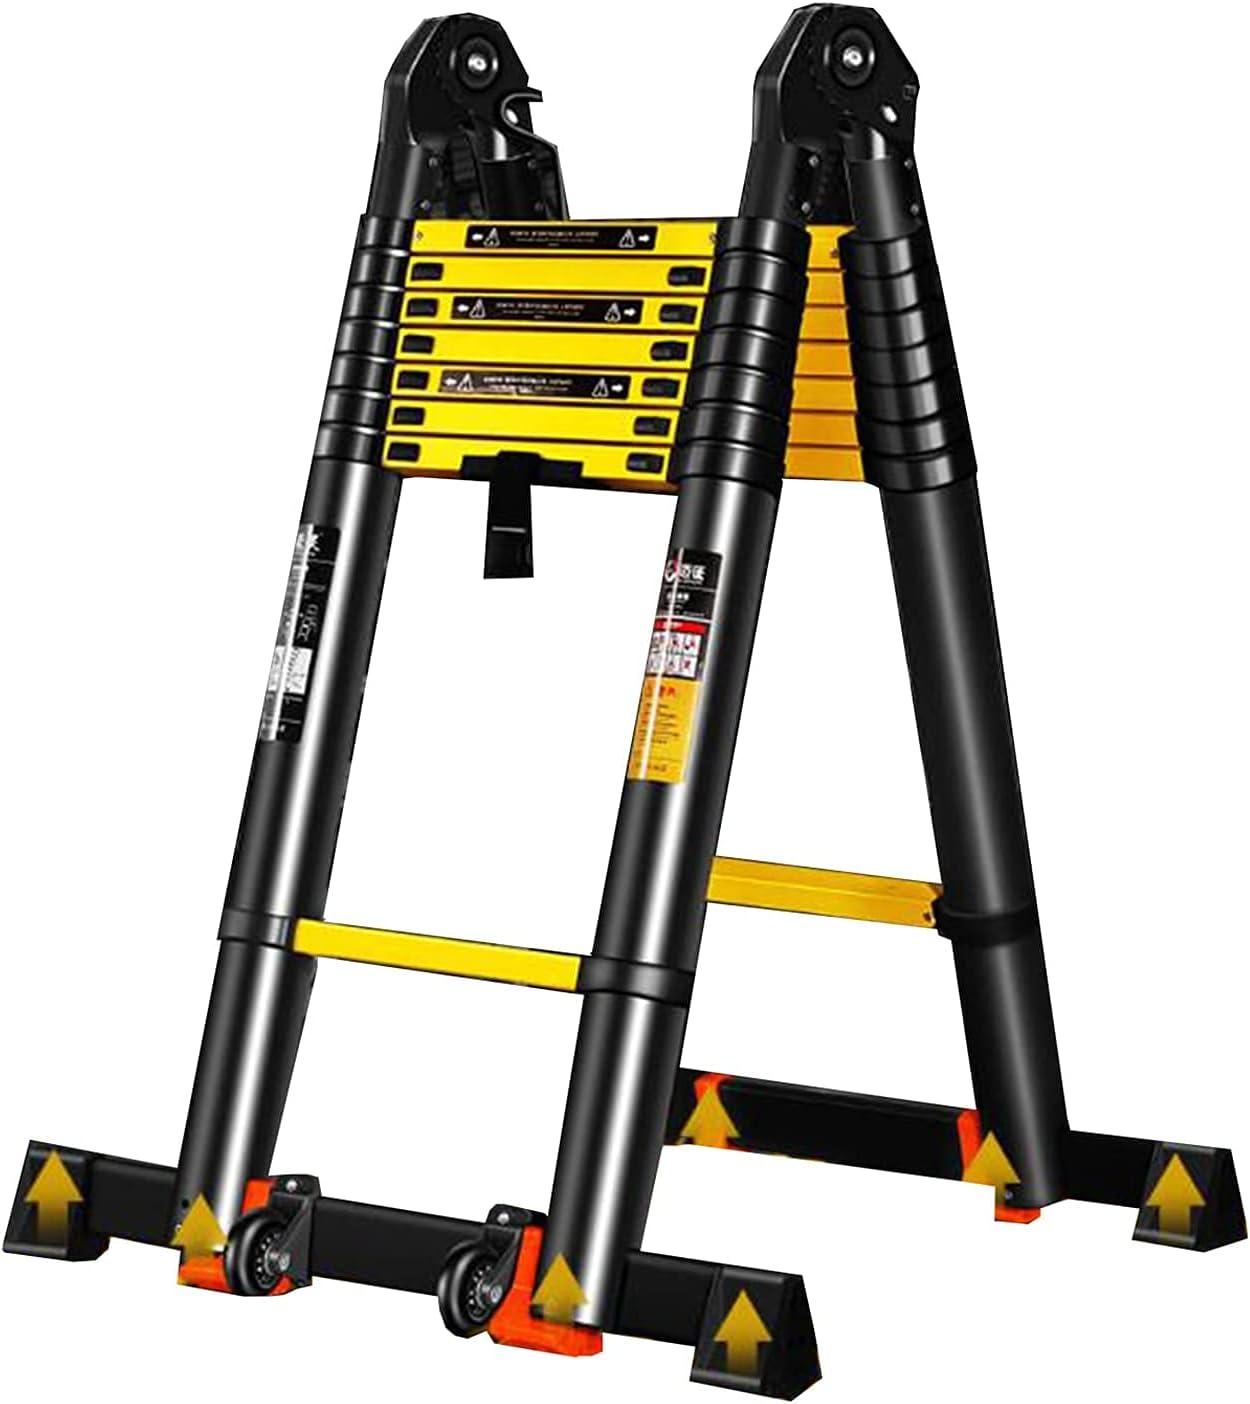 HBSC Mult-Purpose Max 51% OFF Telescopic Folding Aluminium Portable Chicago Mall Ladders